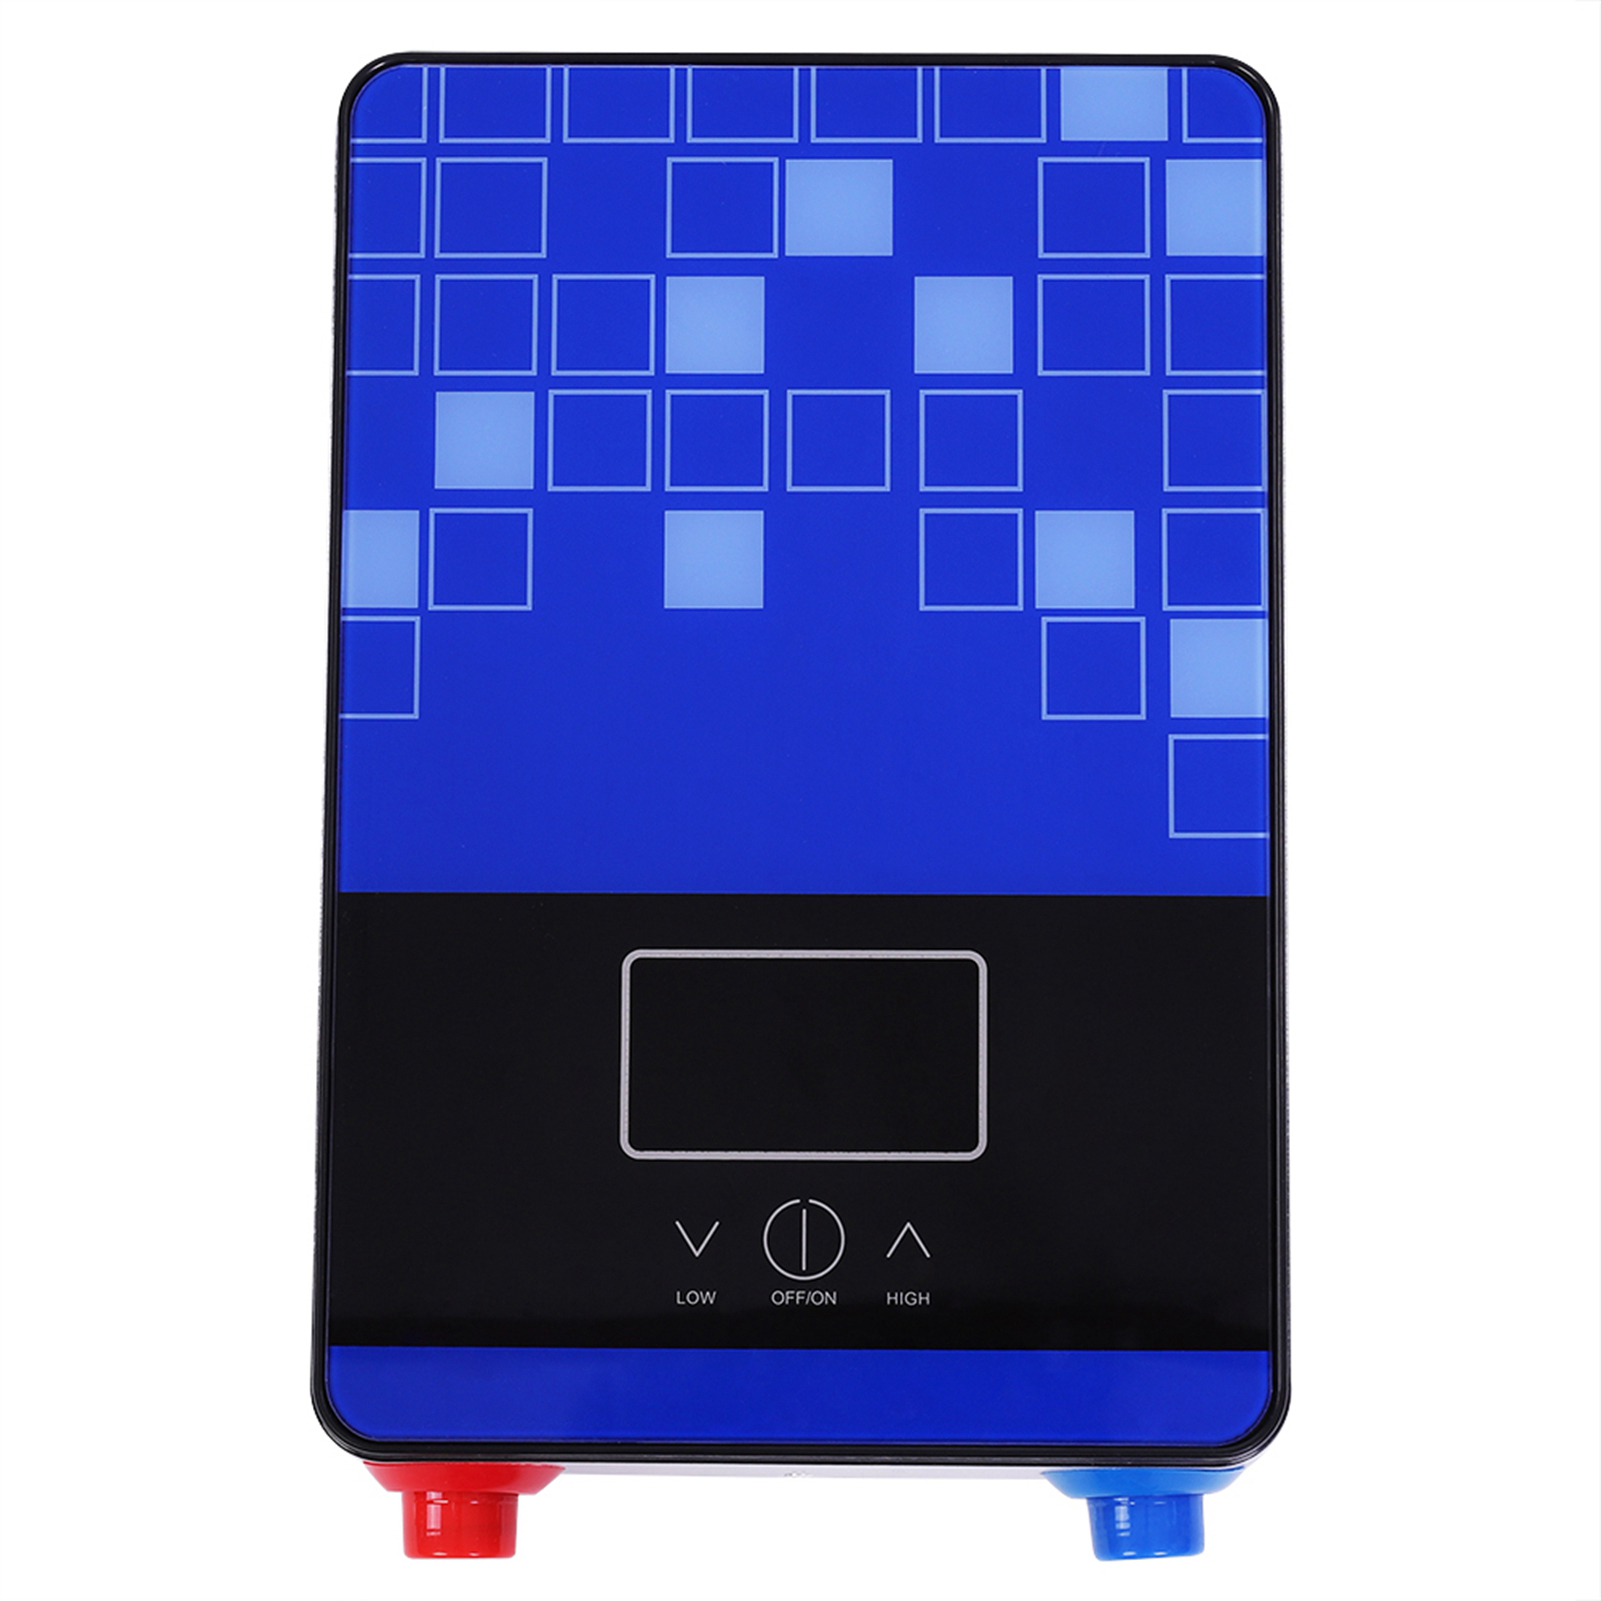 6500w scaldacqua elettrico istantaneo scaldabagno tankless doccia bagno scaldino ebay - Scaldabagno elettrico istantaneo ...